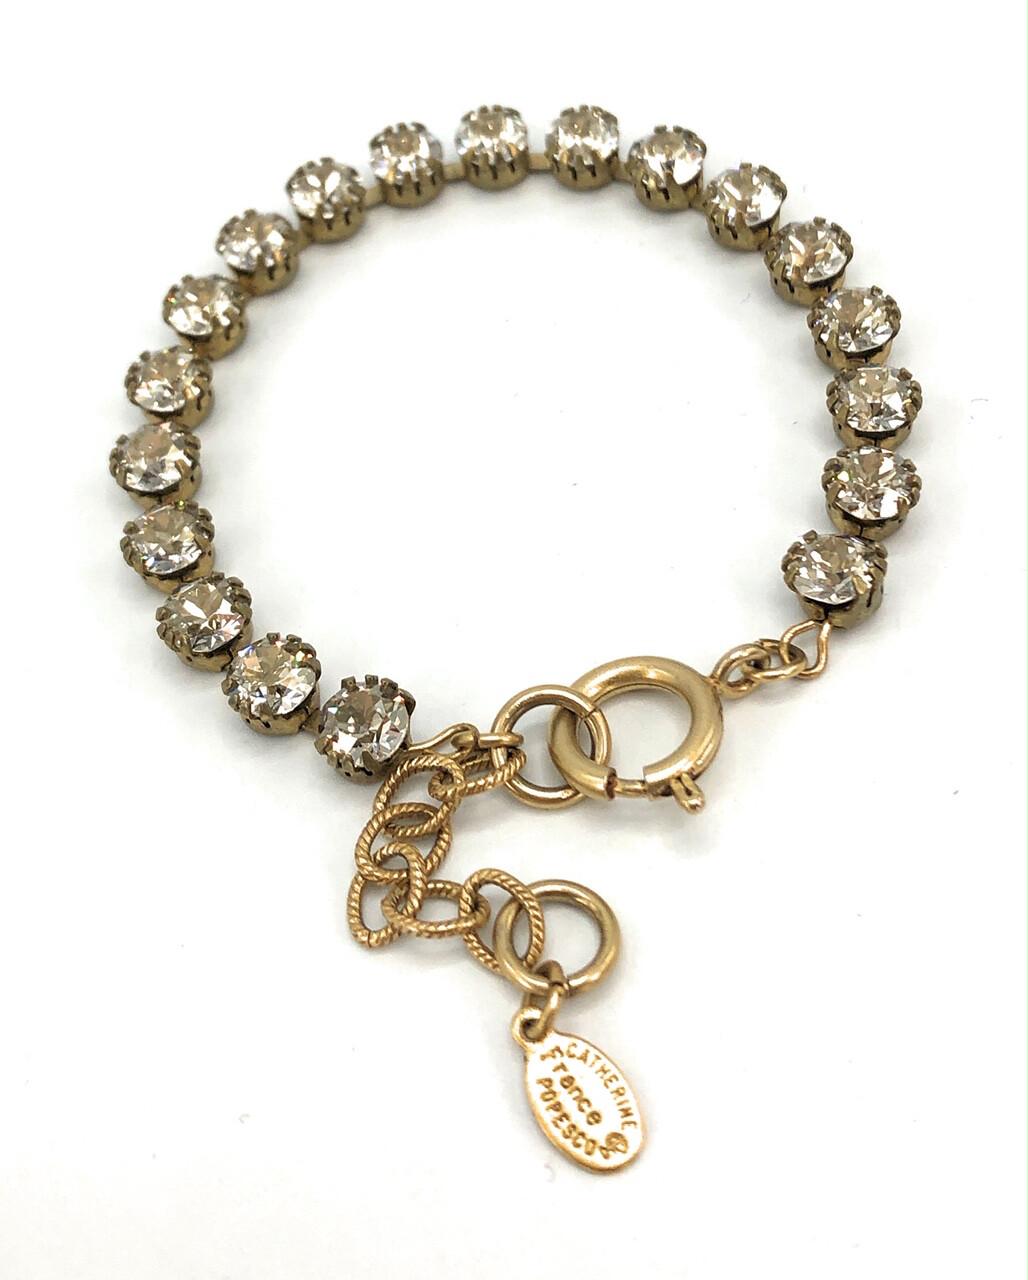 TENNIS BRACELET Gold With Light Gray Swarovski Crystal